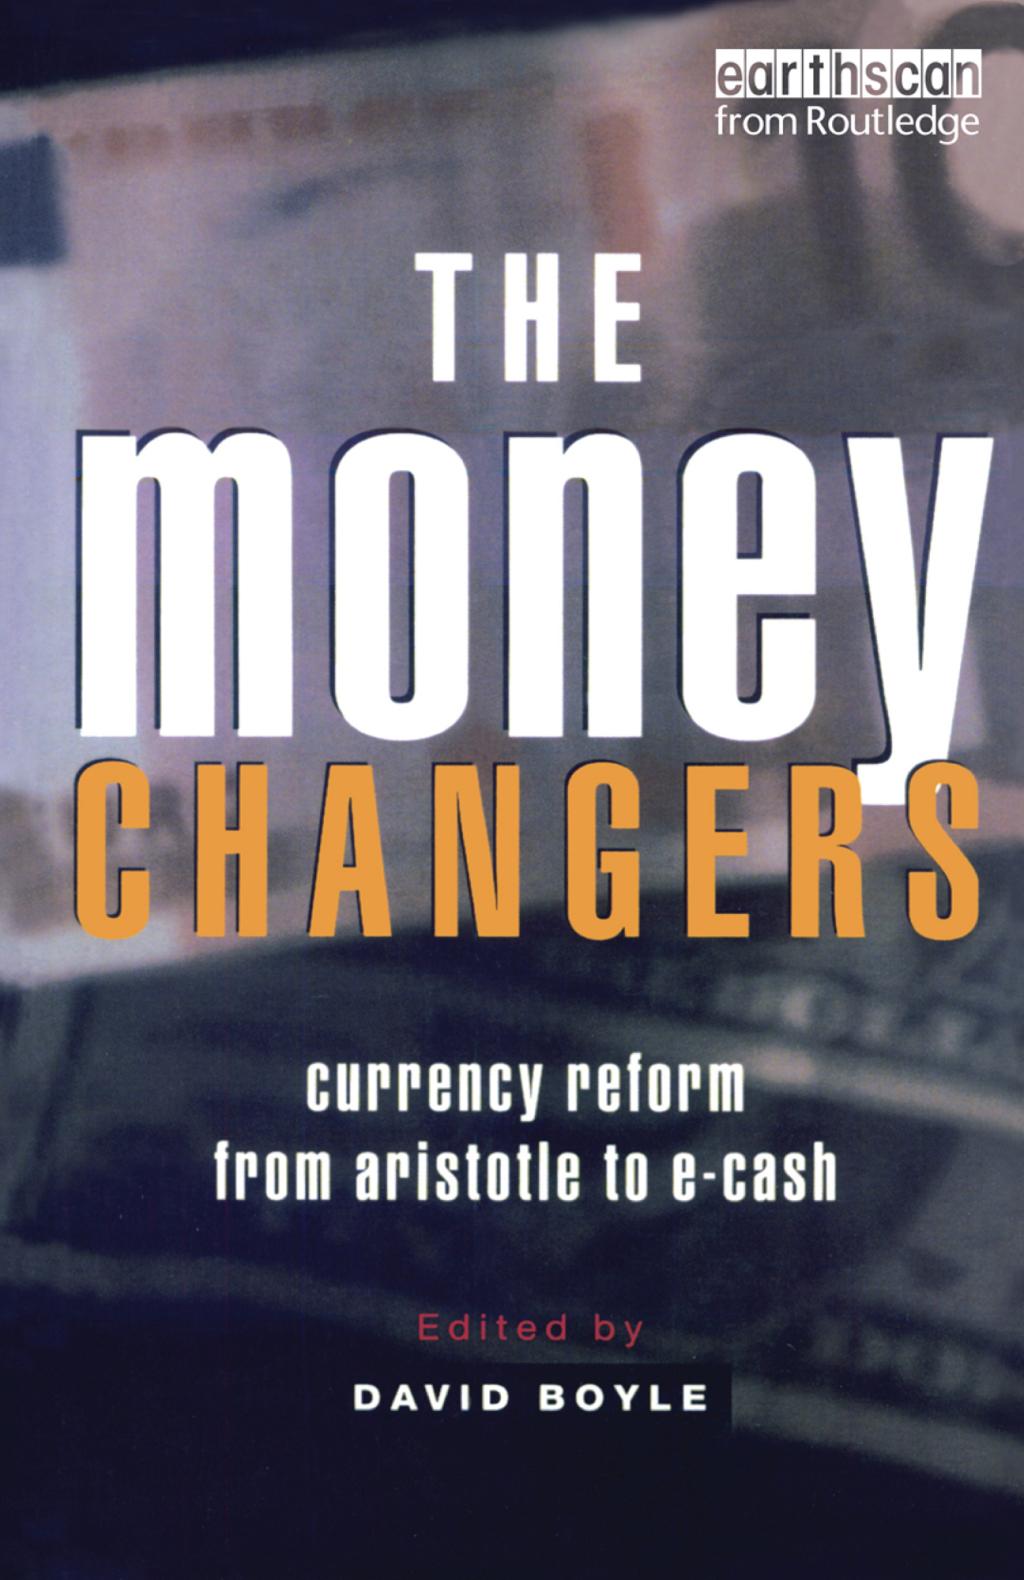 The Money Changers (eBook) (9781134208135) photo